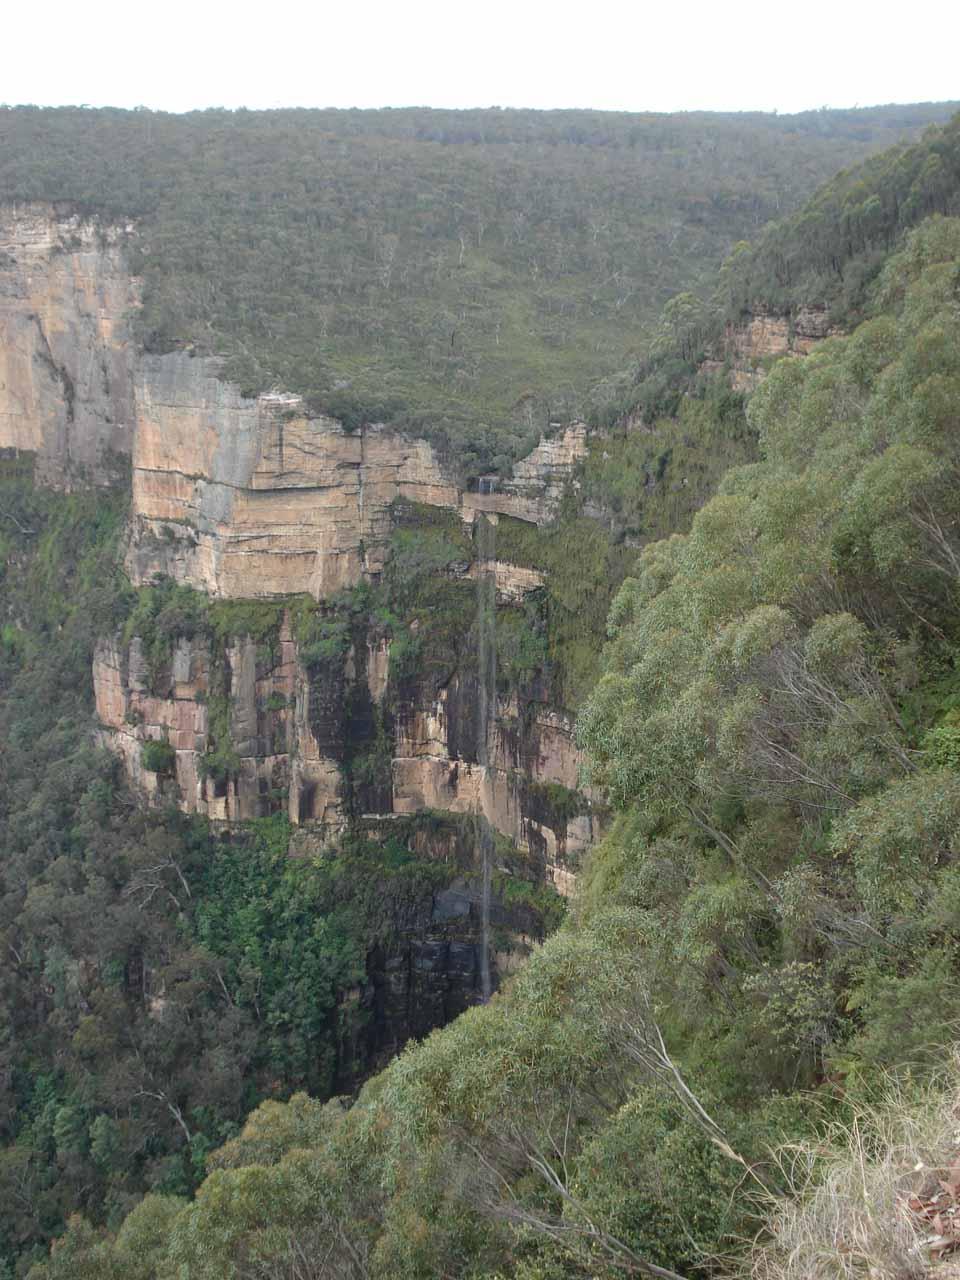 Focused on the Bridal Veil Falls or Govett's Leap